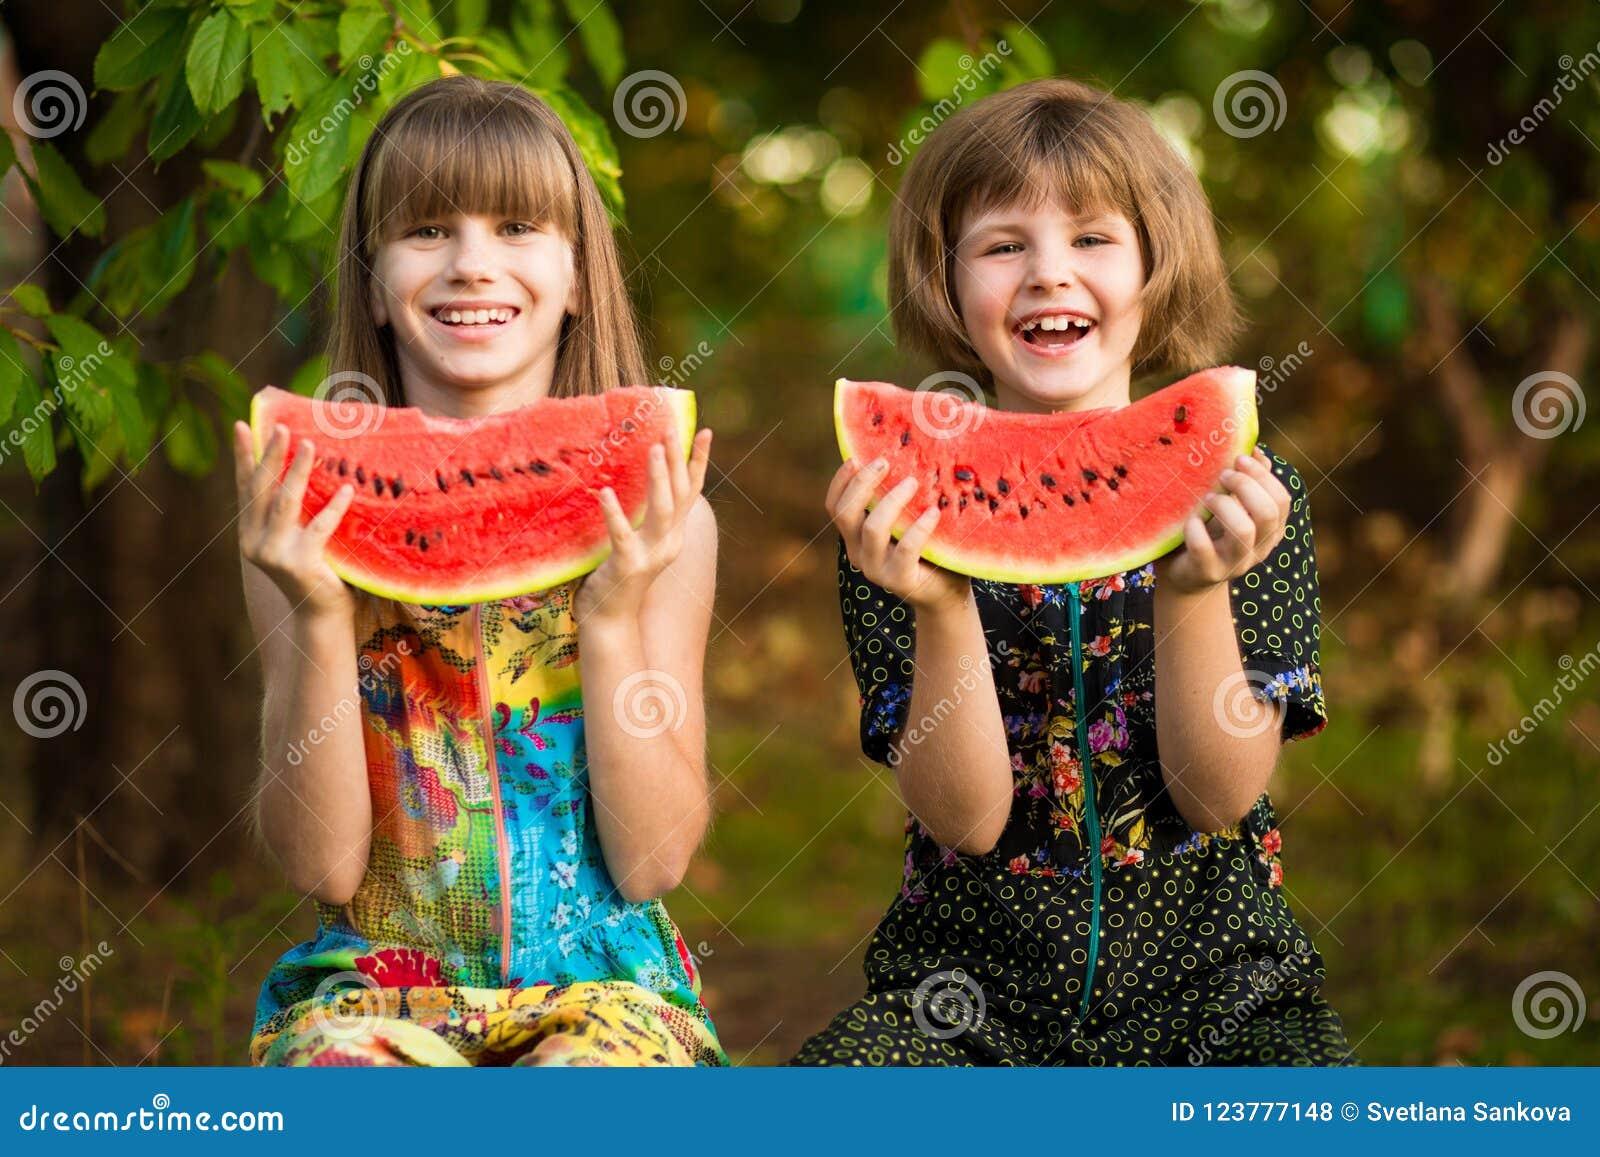 Funny little sisters girl eats watermelon in summer